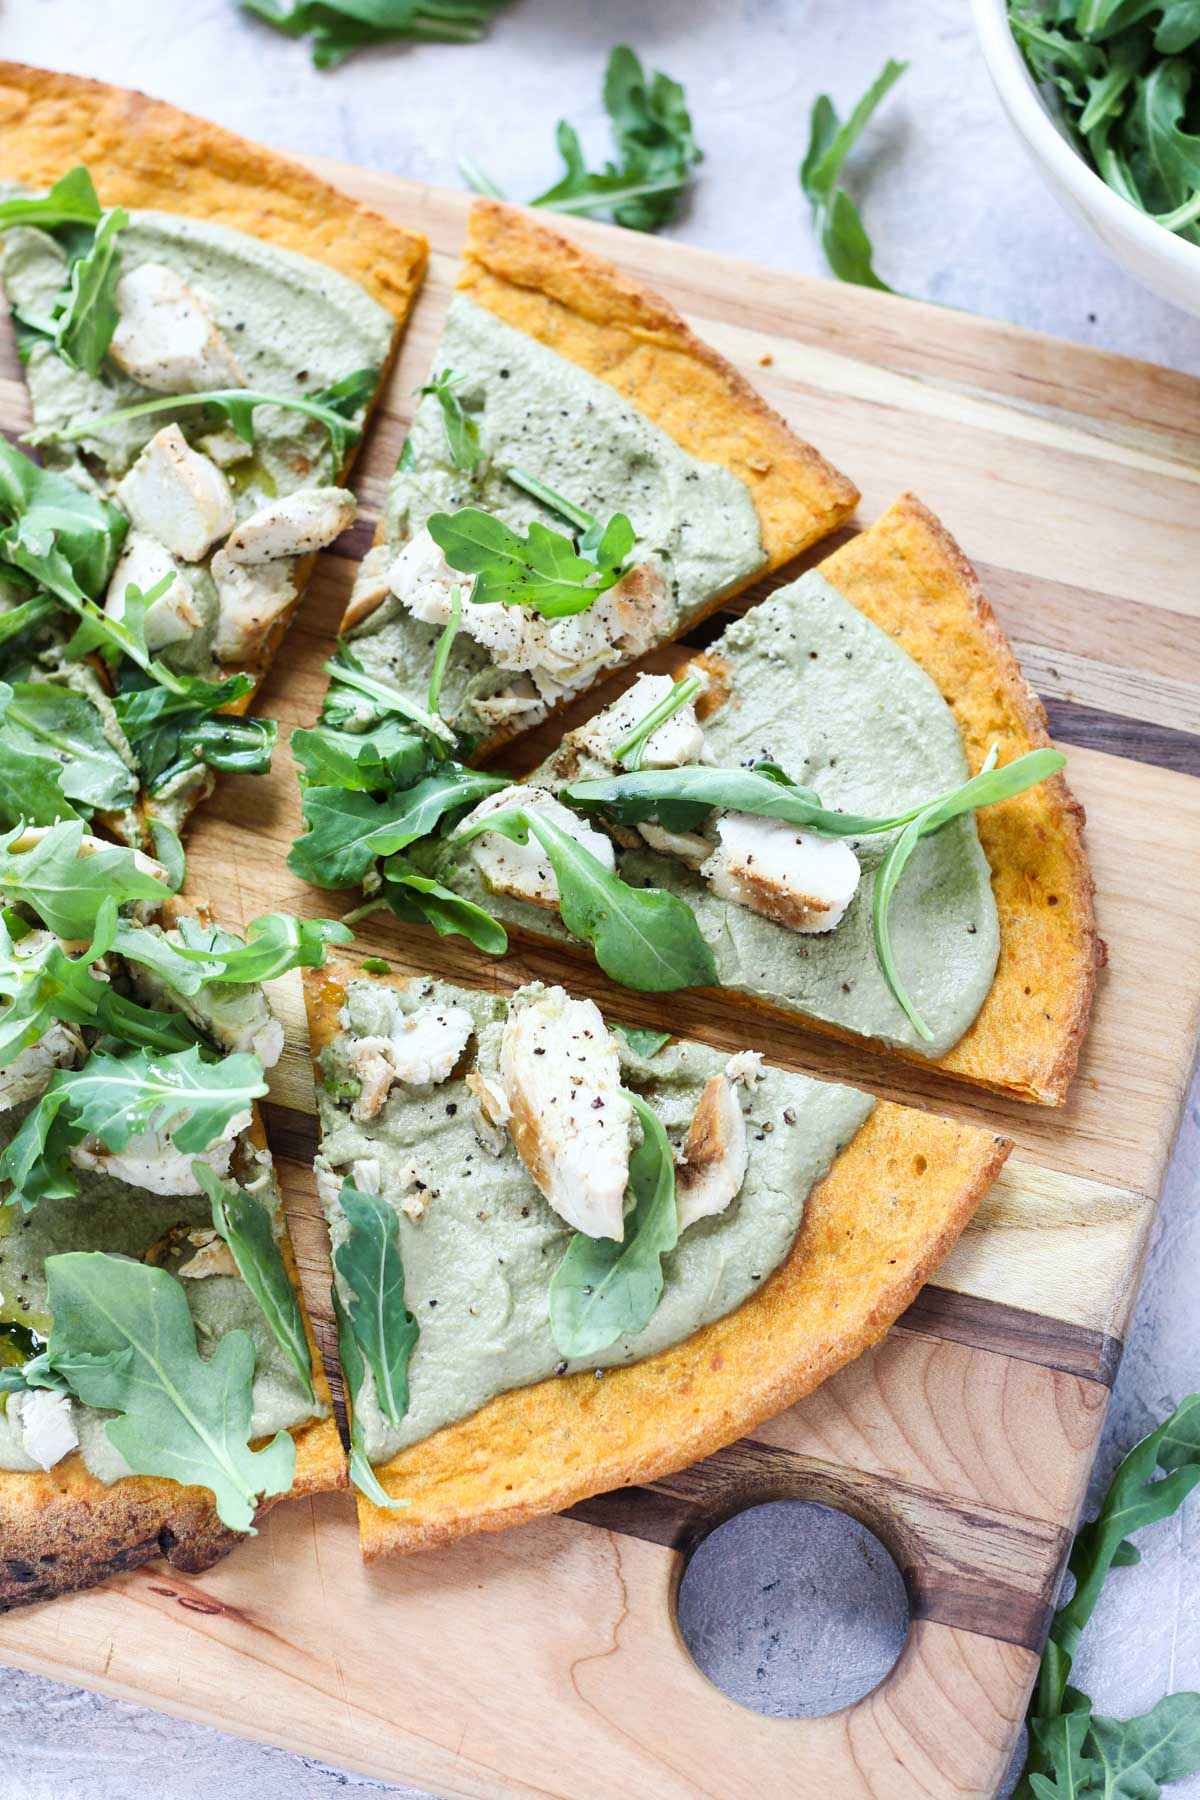 Pesto pizza on cutting board.